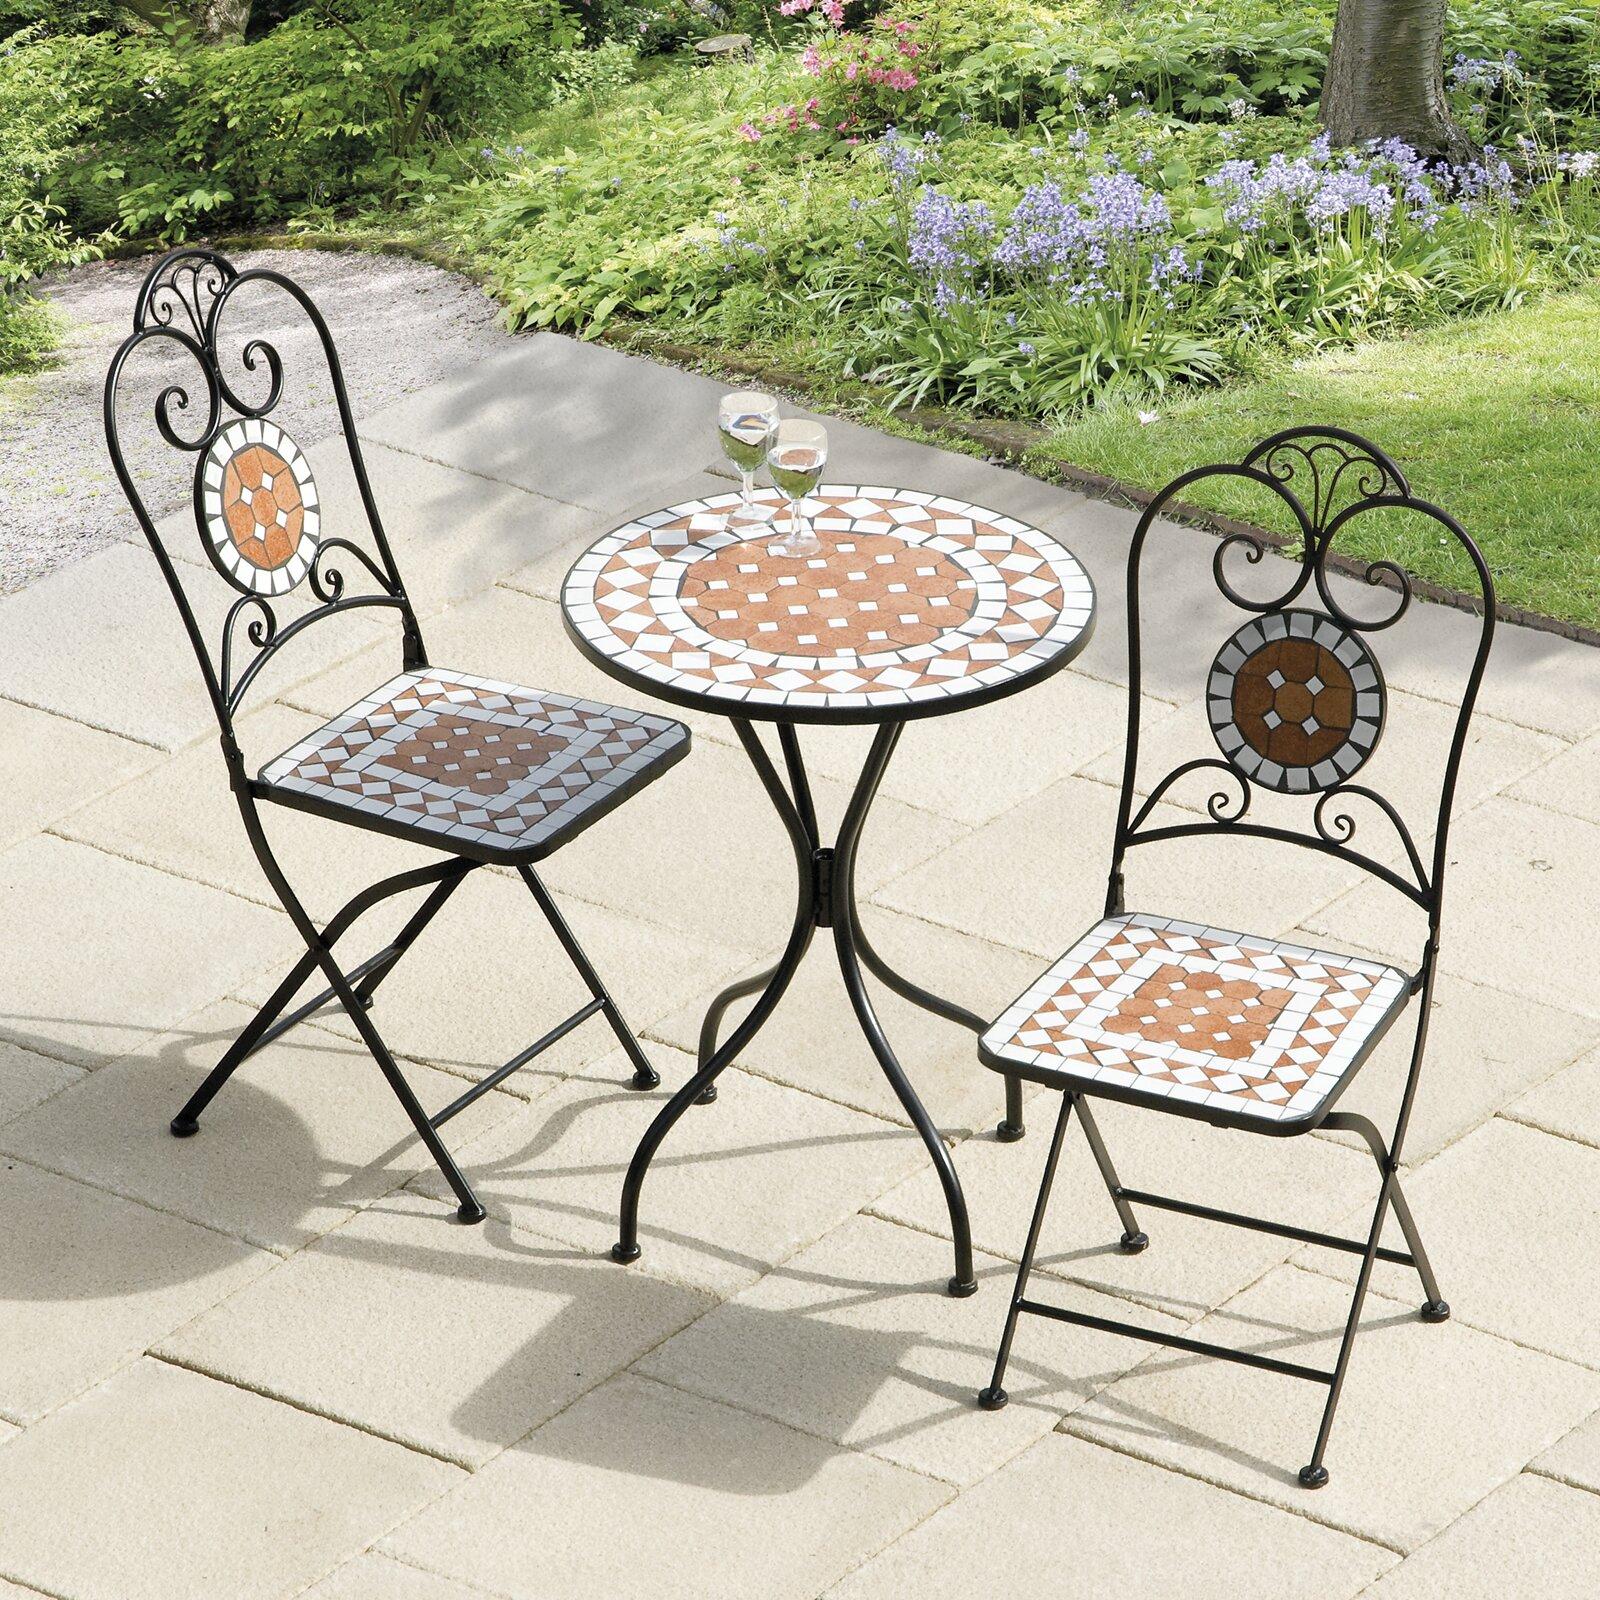 SunTime Outdoor Living Diamond Mosaic 3 Piece Bistro Set ... on Suntime Outdoor Living id=30717